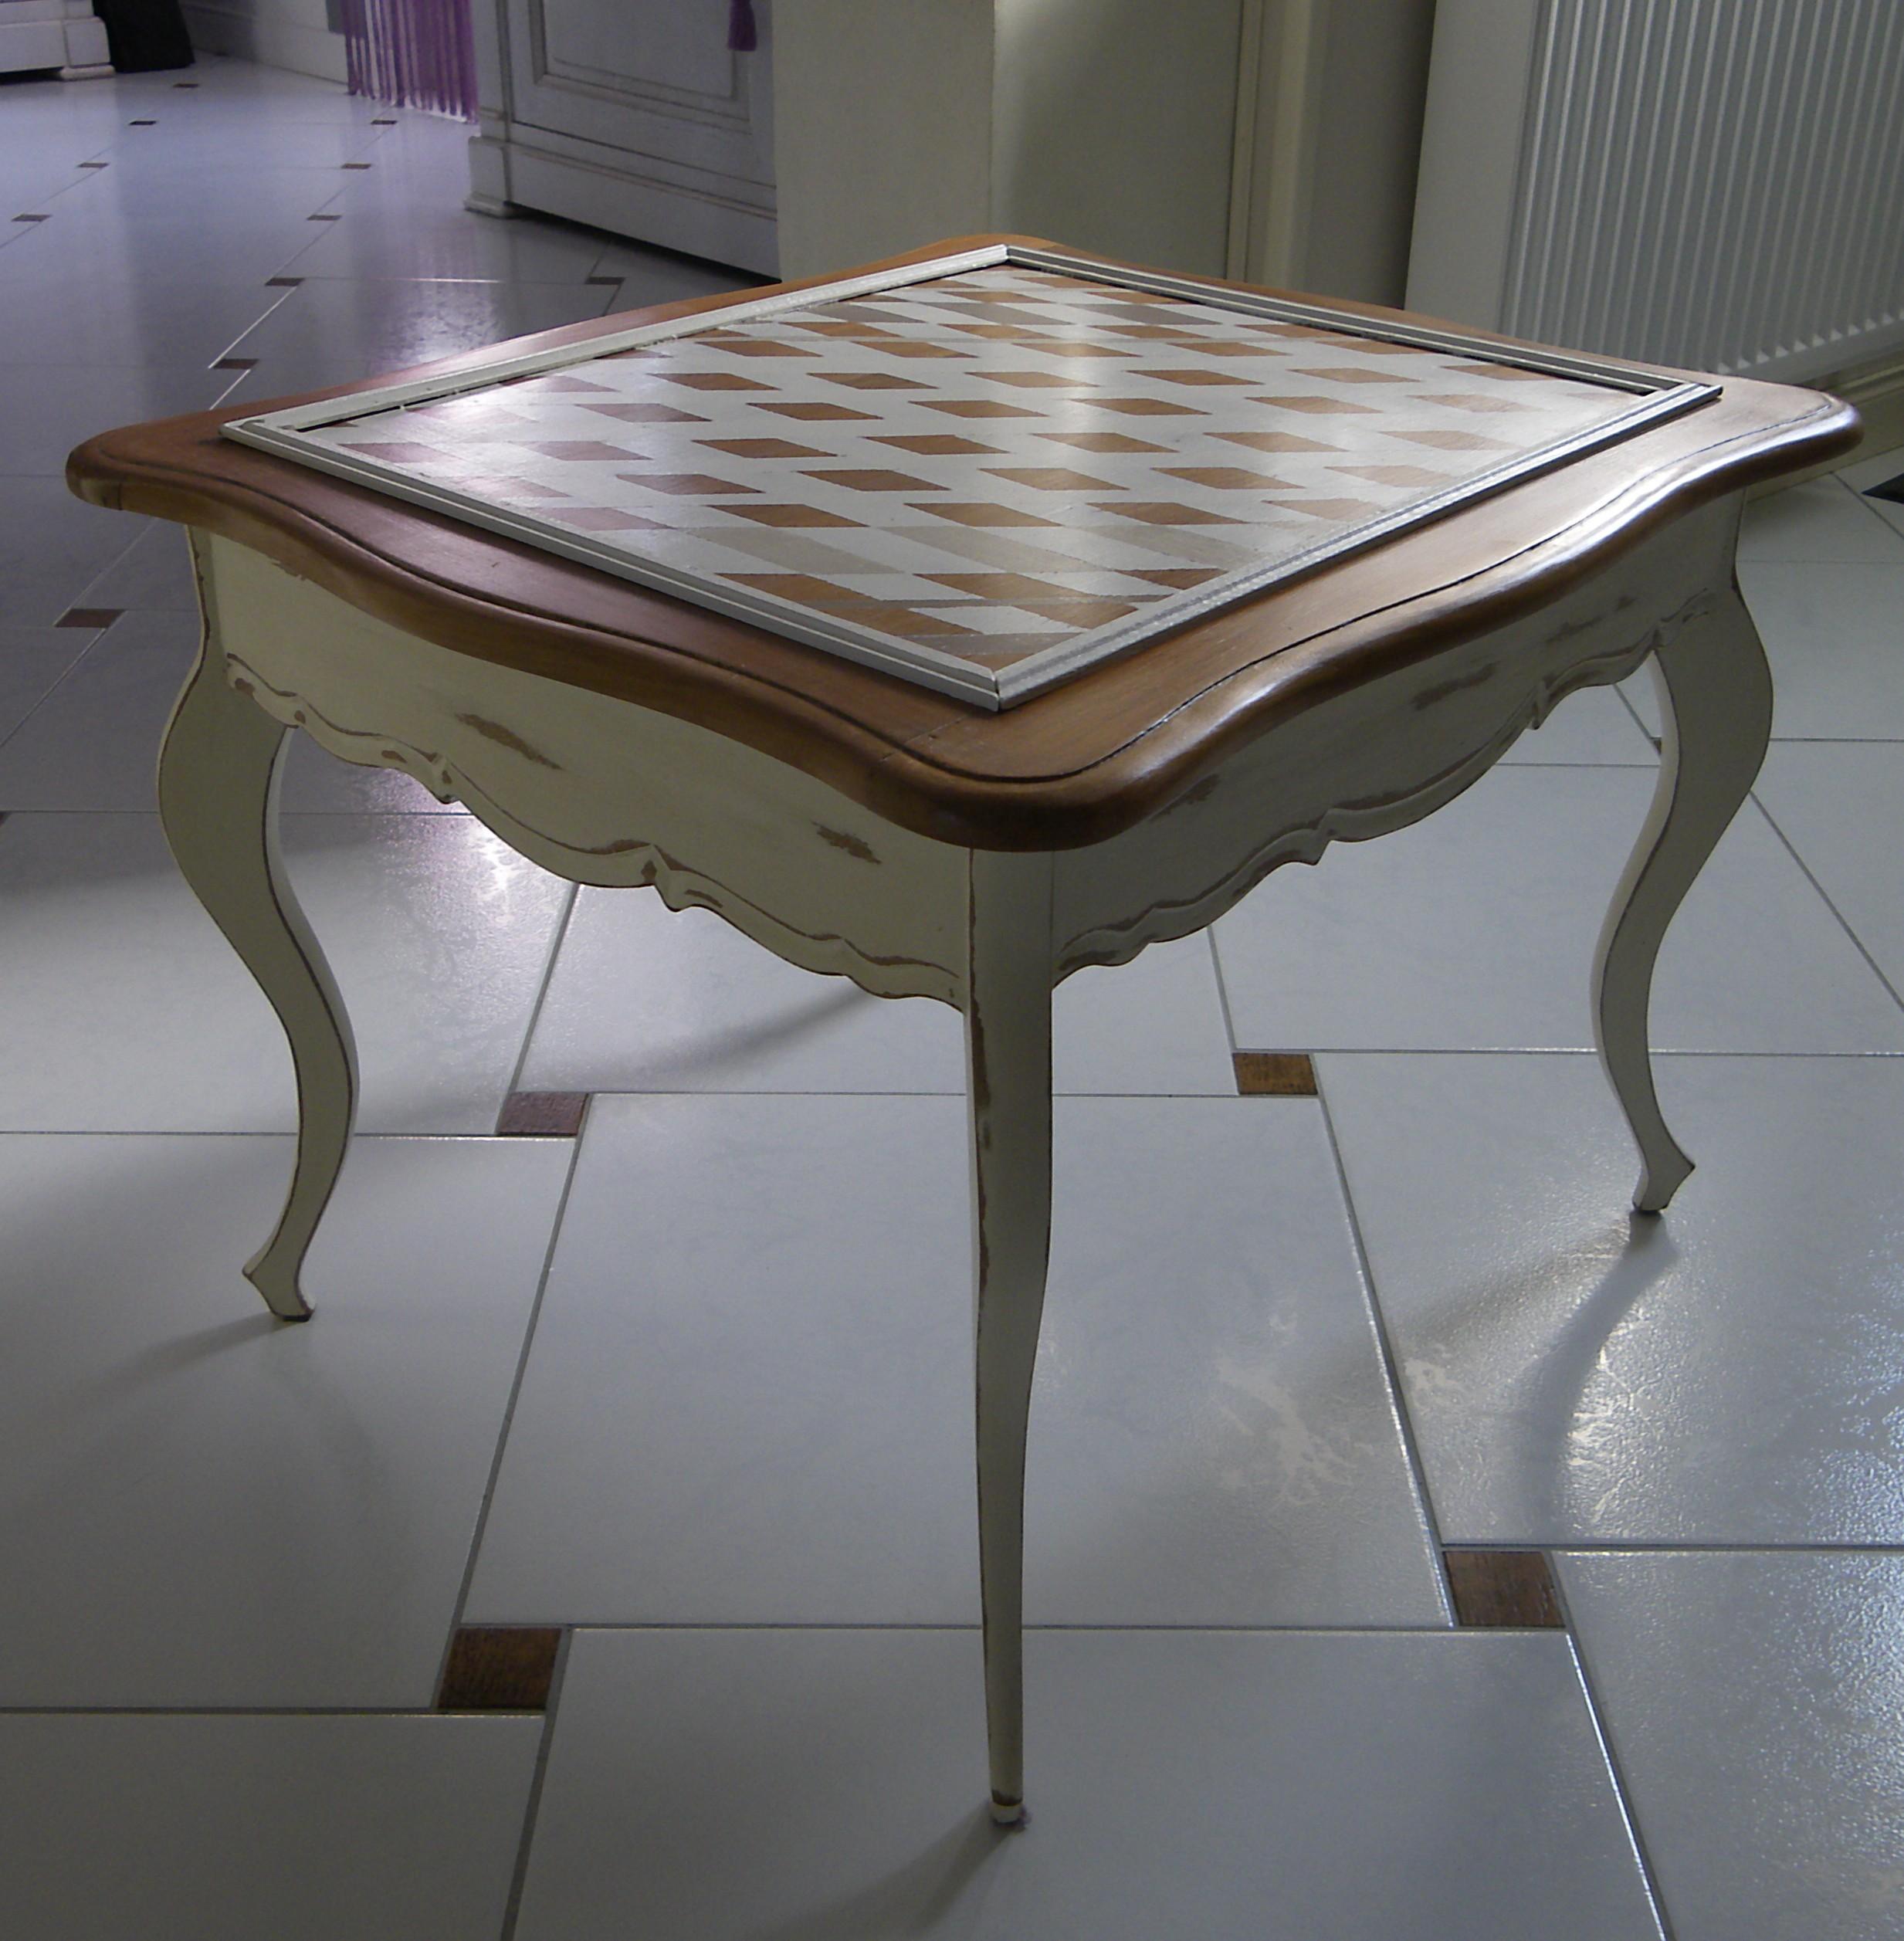 table basse table d appoint en merisier patin e anjoudeco. Black Bedroom Furniture Sets. Home Design Ideas